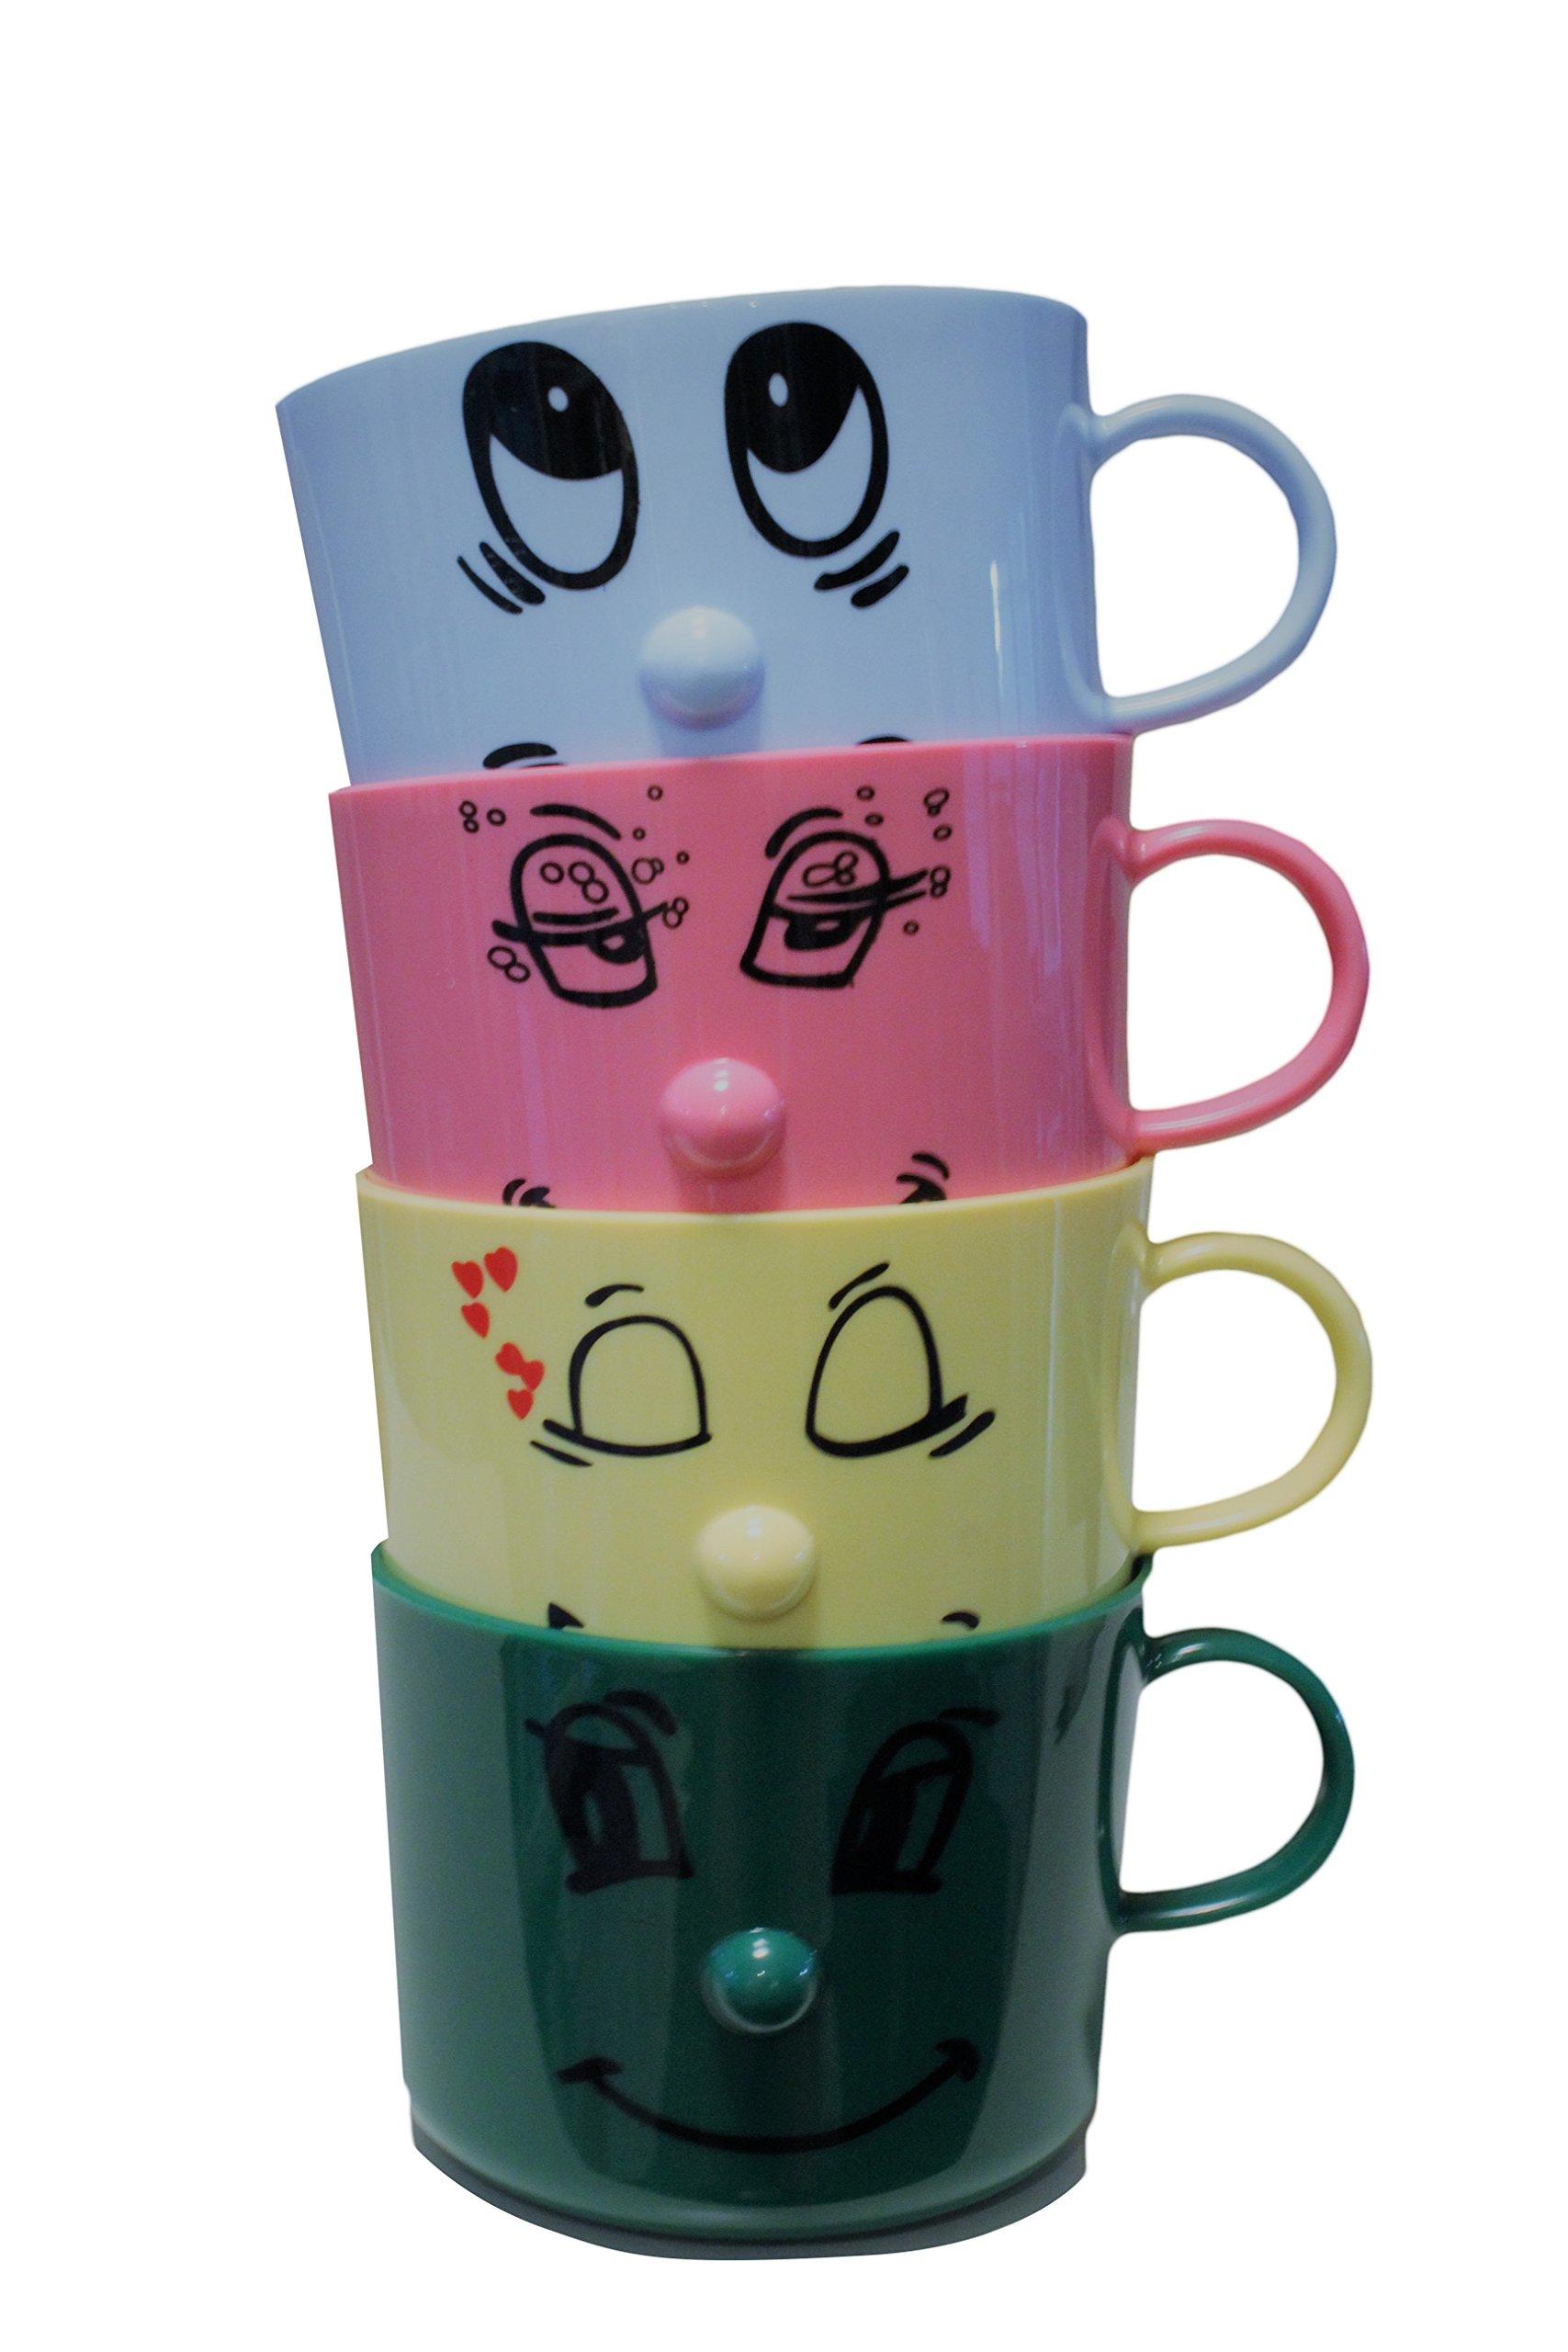 Silly Face Mugs Set of 4 | Funny Mugs | Kids Mugs | Dinnerware Set | Stacking Mugs